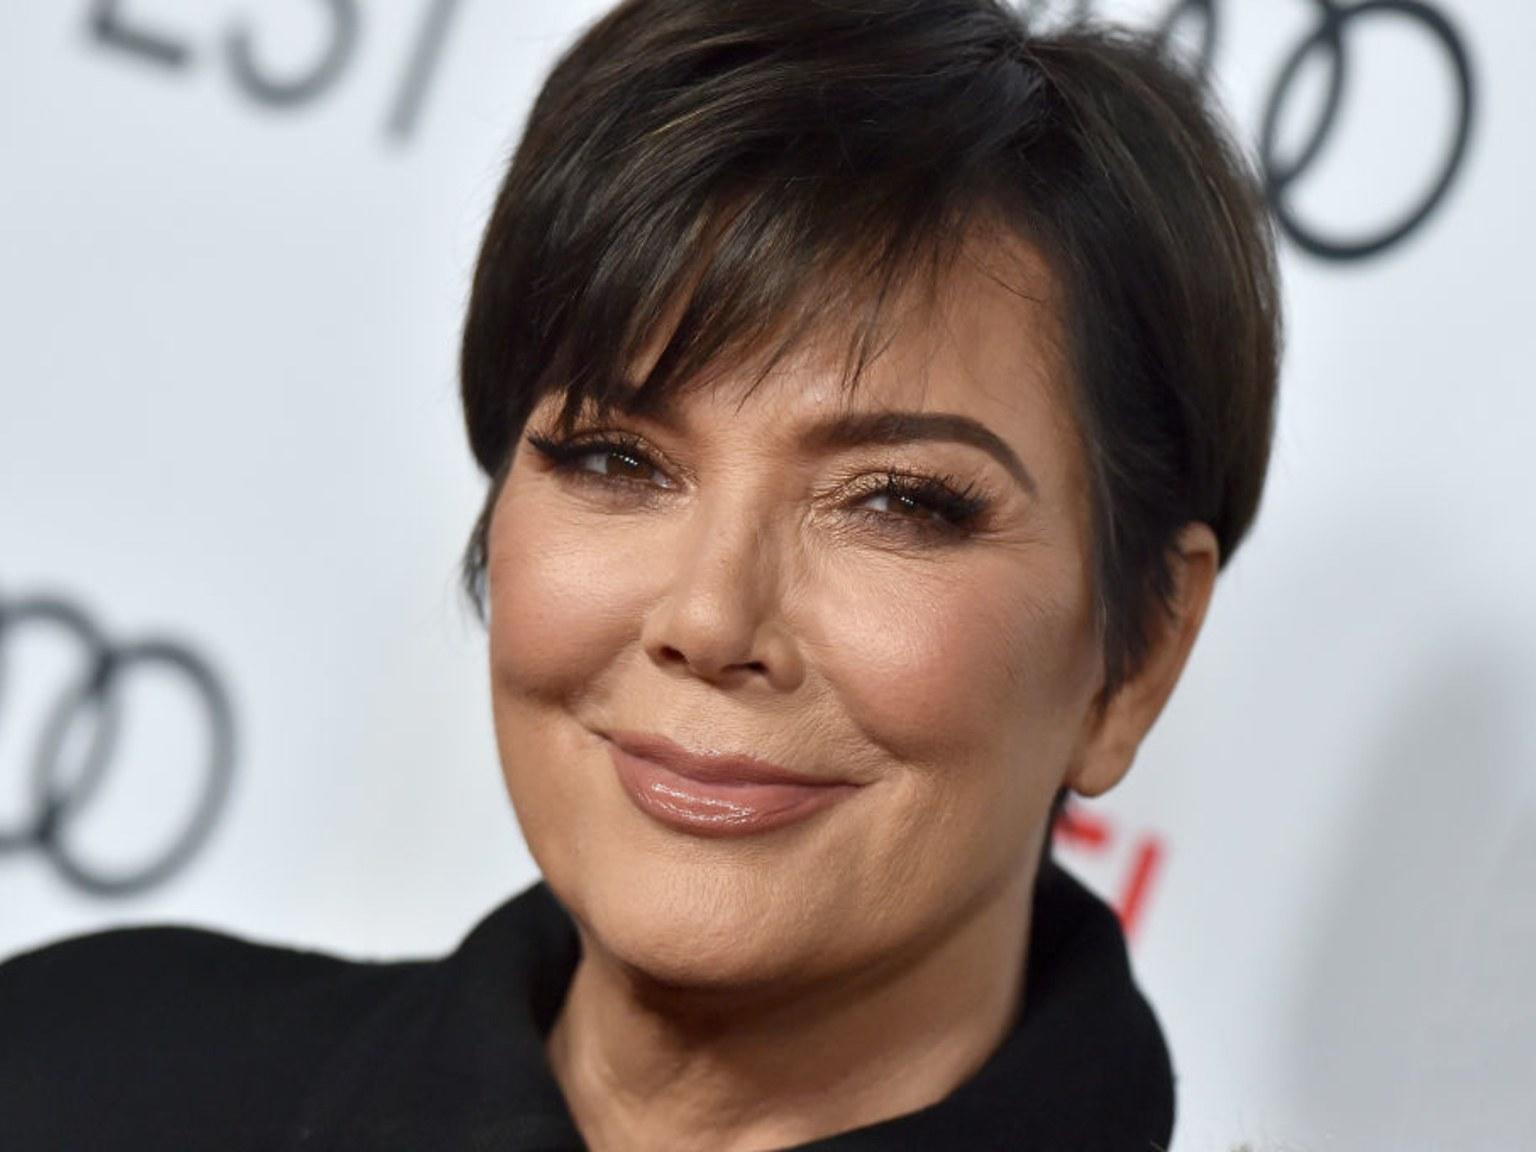 Kris Jenner is disliked